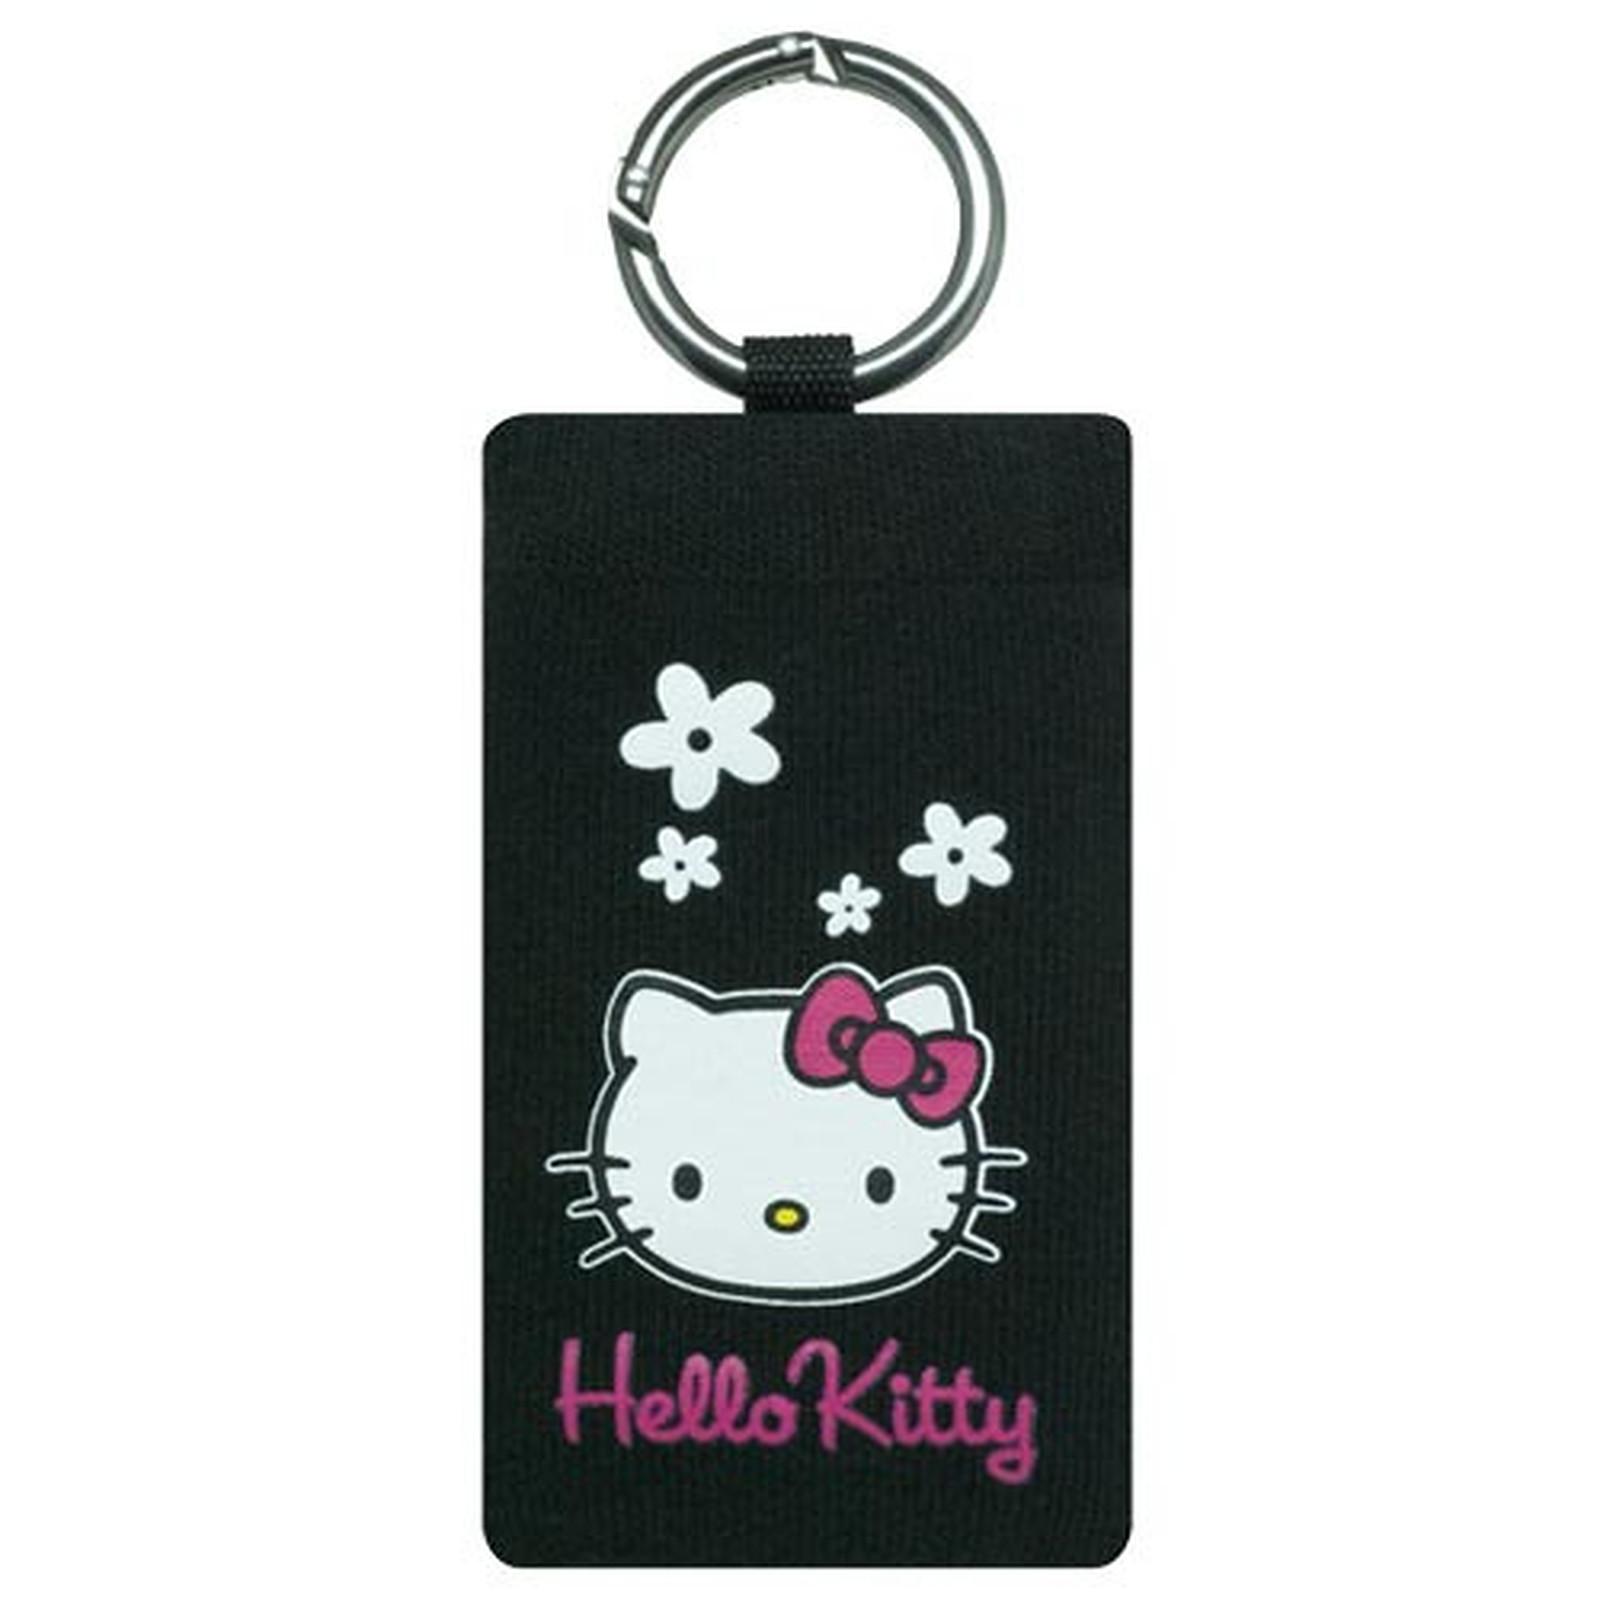 Hello Kitty - Chaussette fleur Hello Kitty (coloris noir)